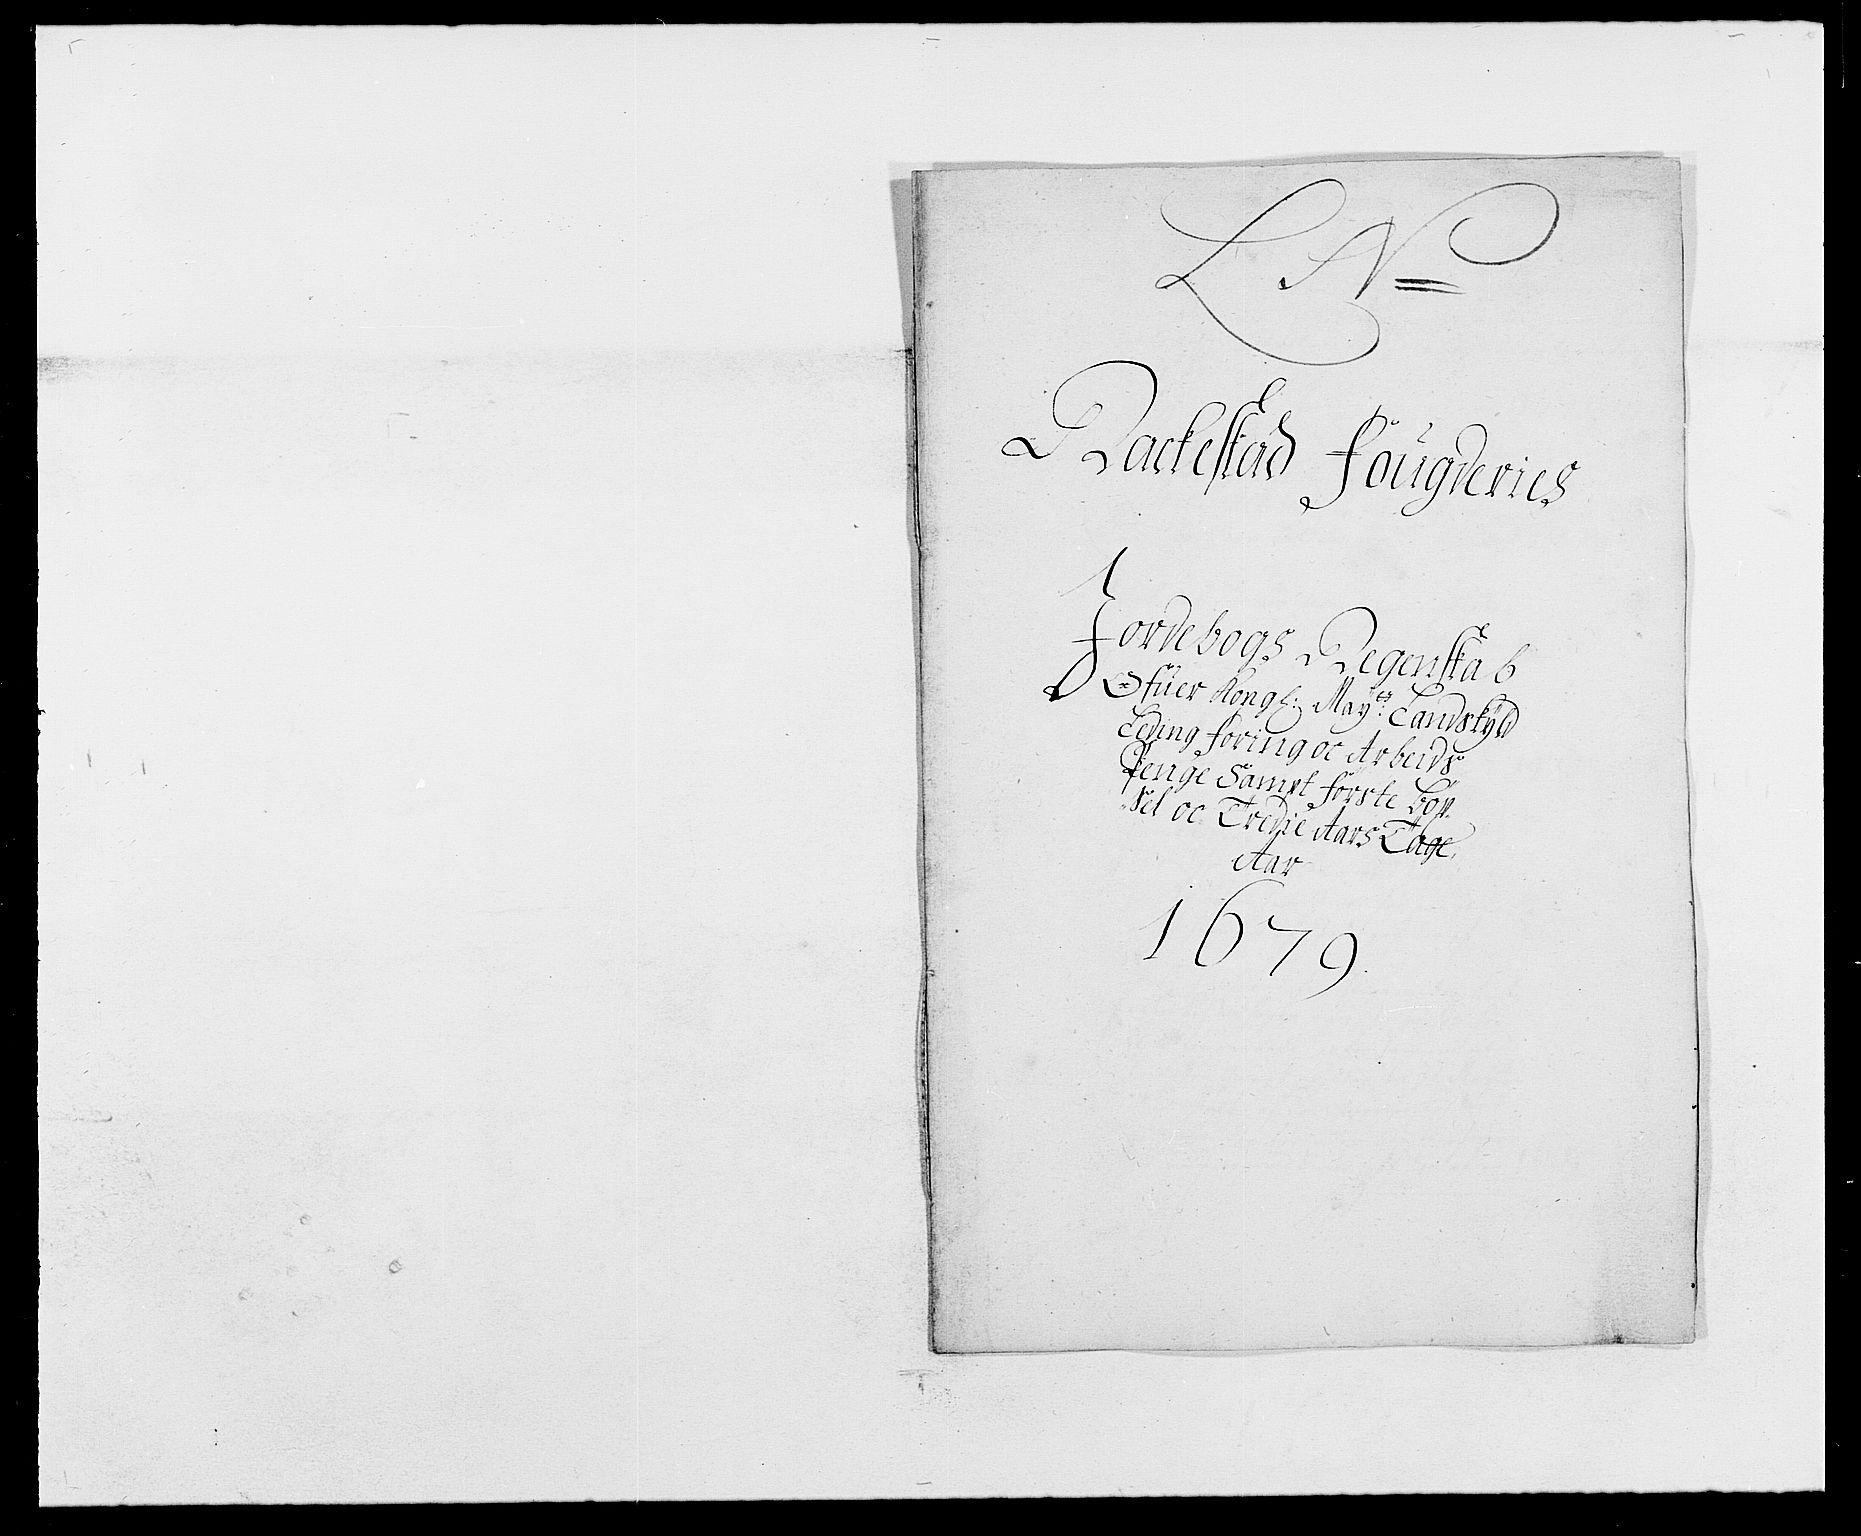 RA, Rentekammeret inntil 1814, Reviderte regnskaper, Fogderegnskap, R05/L0271: Fogderegnskap Rakkestad, 1678-1679, s. 249